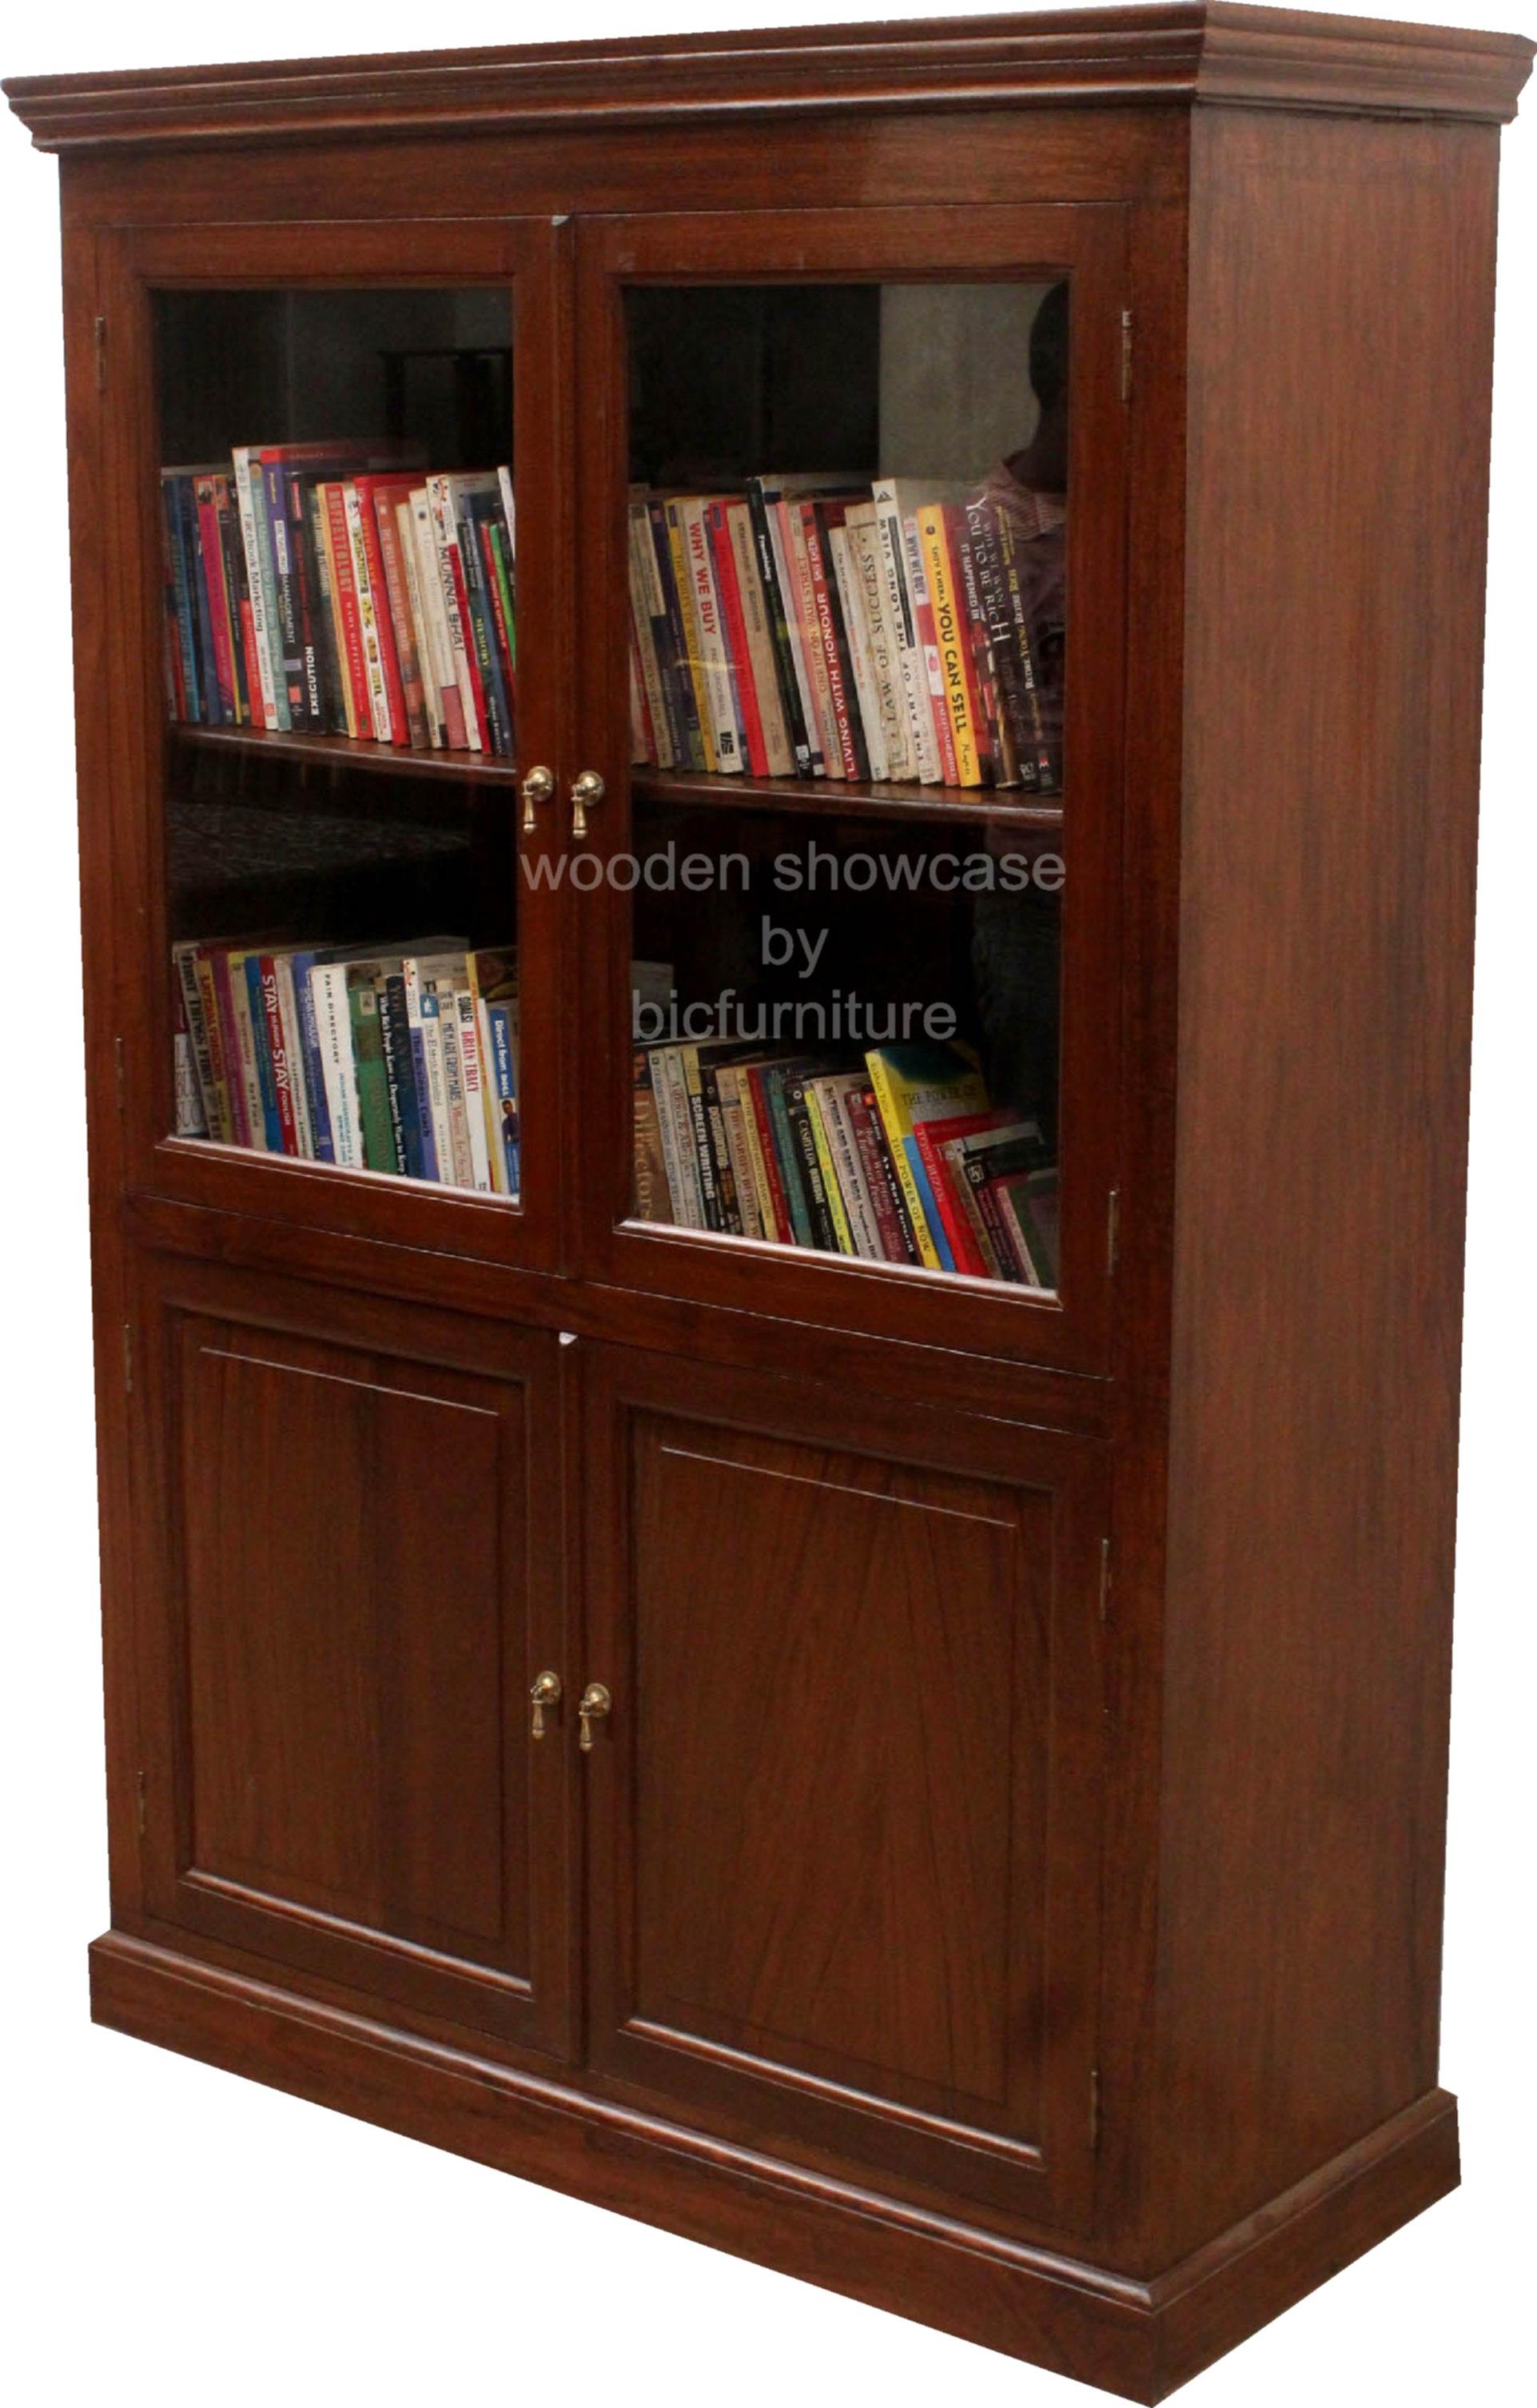 Wooden Showcases For Living Room